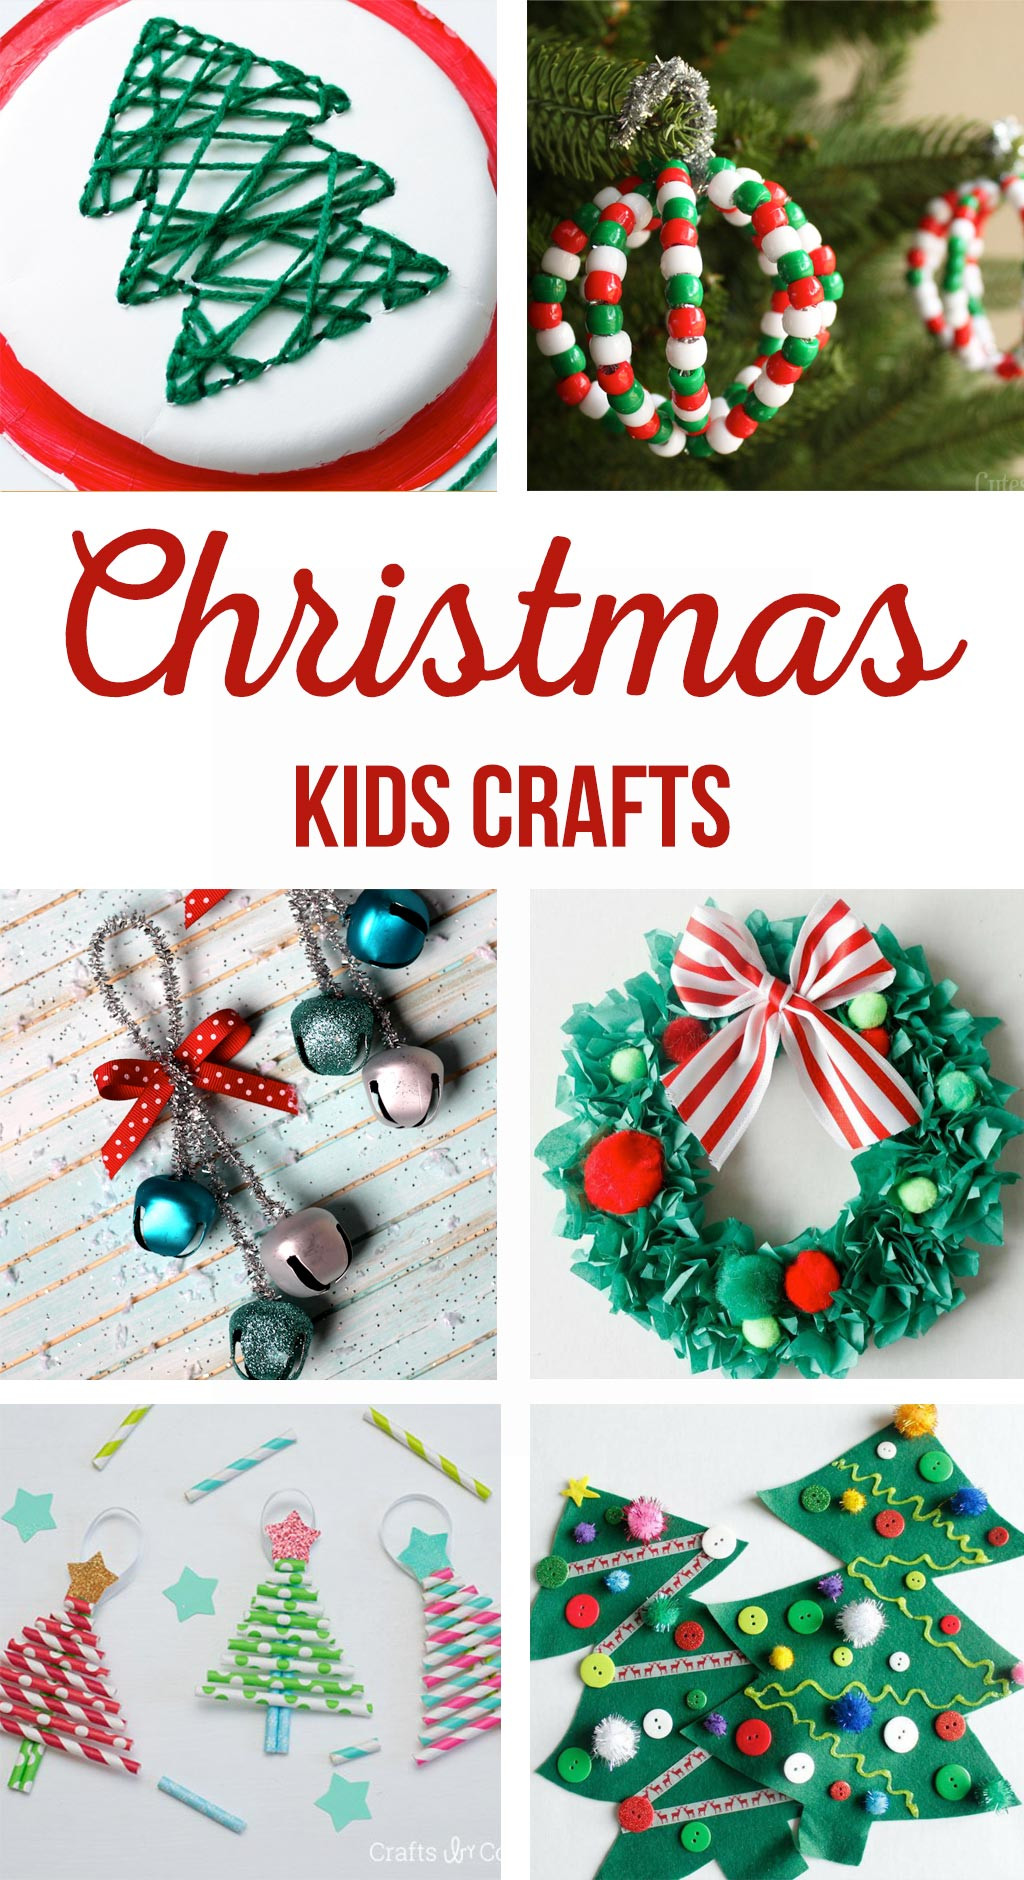 DIY Kids Christmas Craft  Christmas Kids Crafts The Crafting Chicks